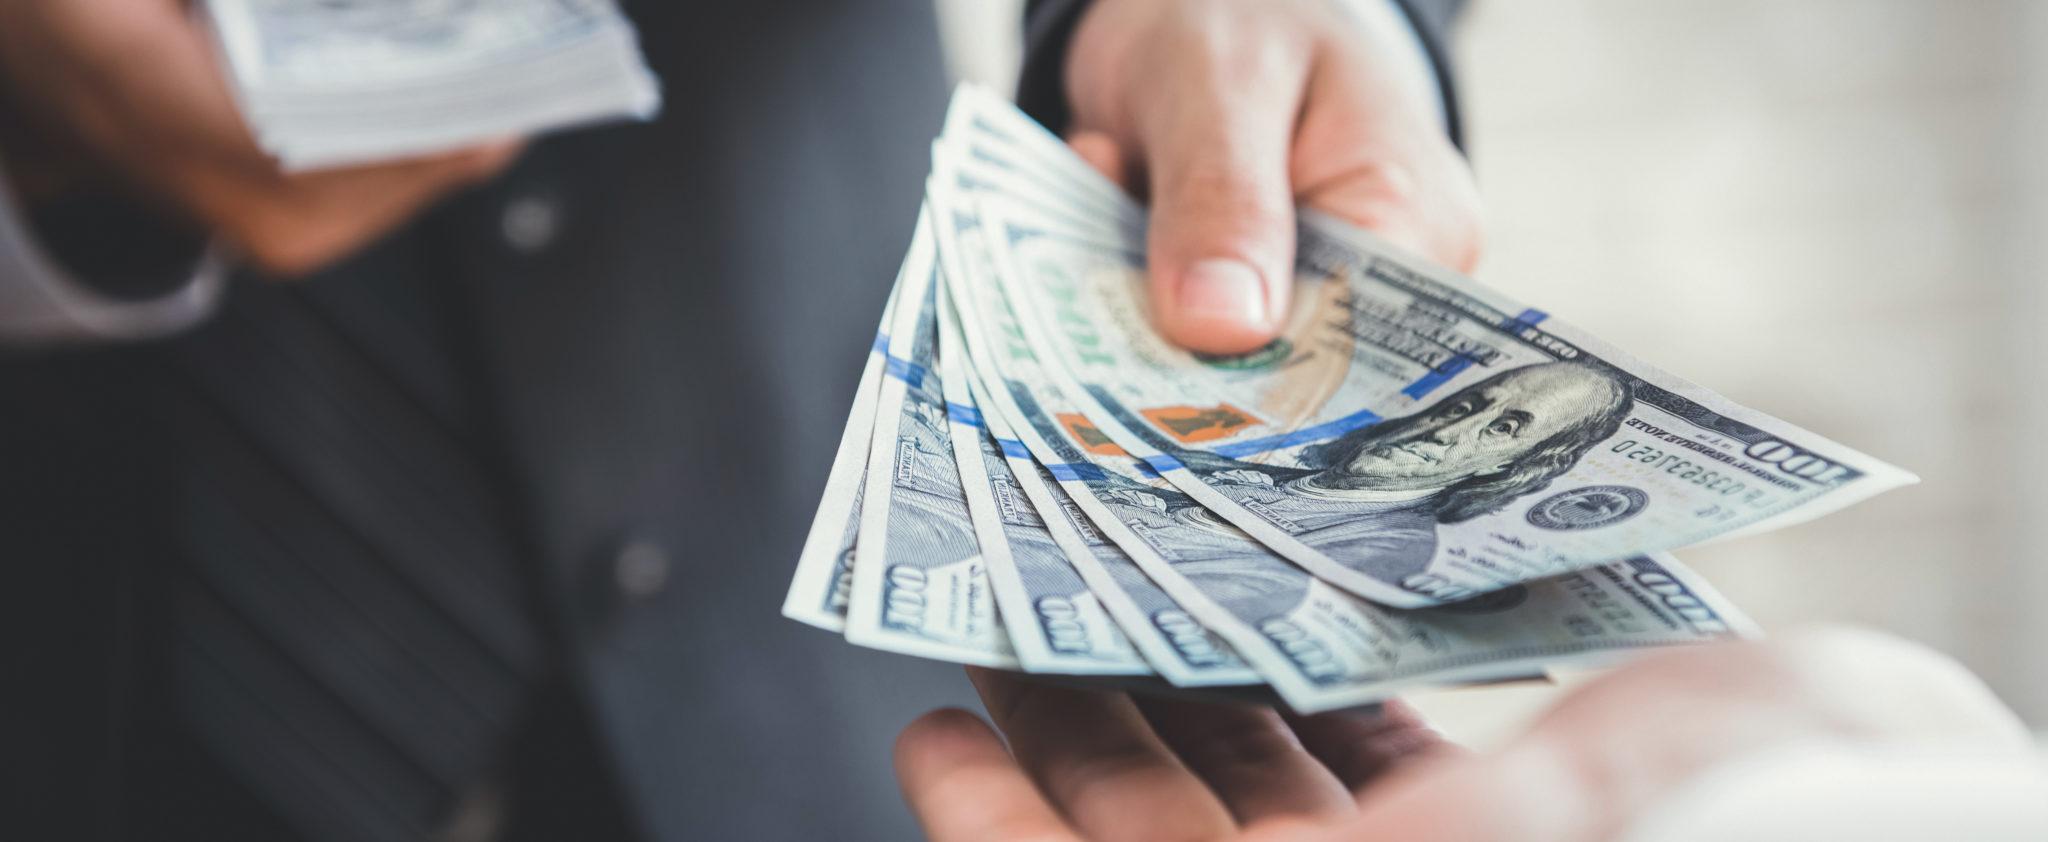 Before Hitting the Listings, Prevent Overspending